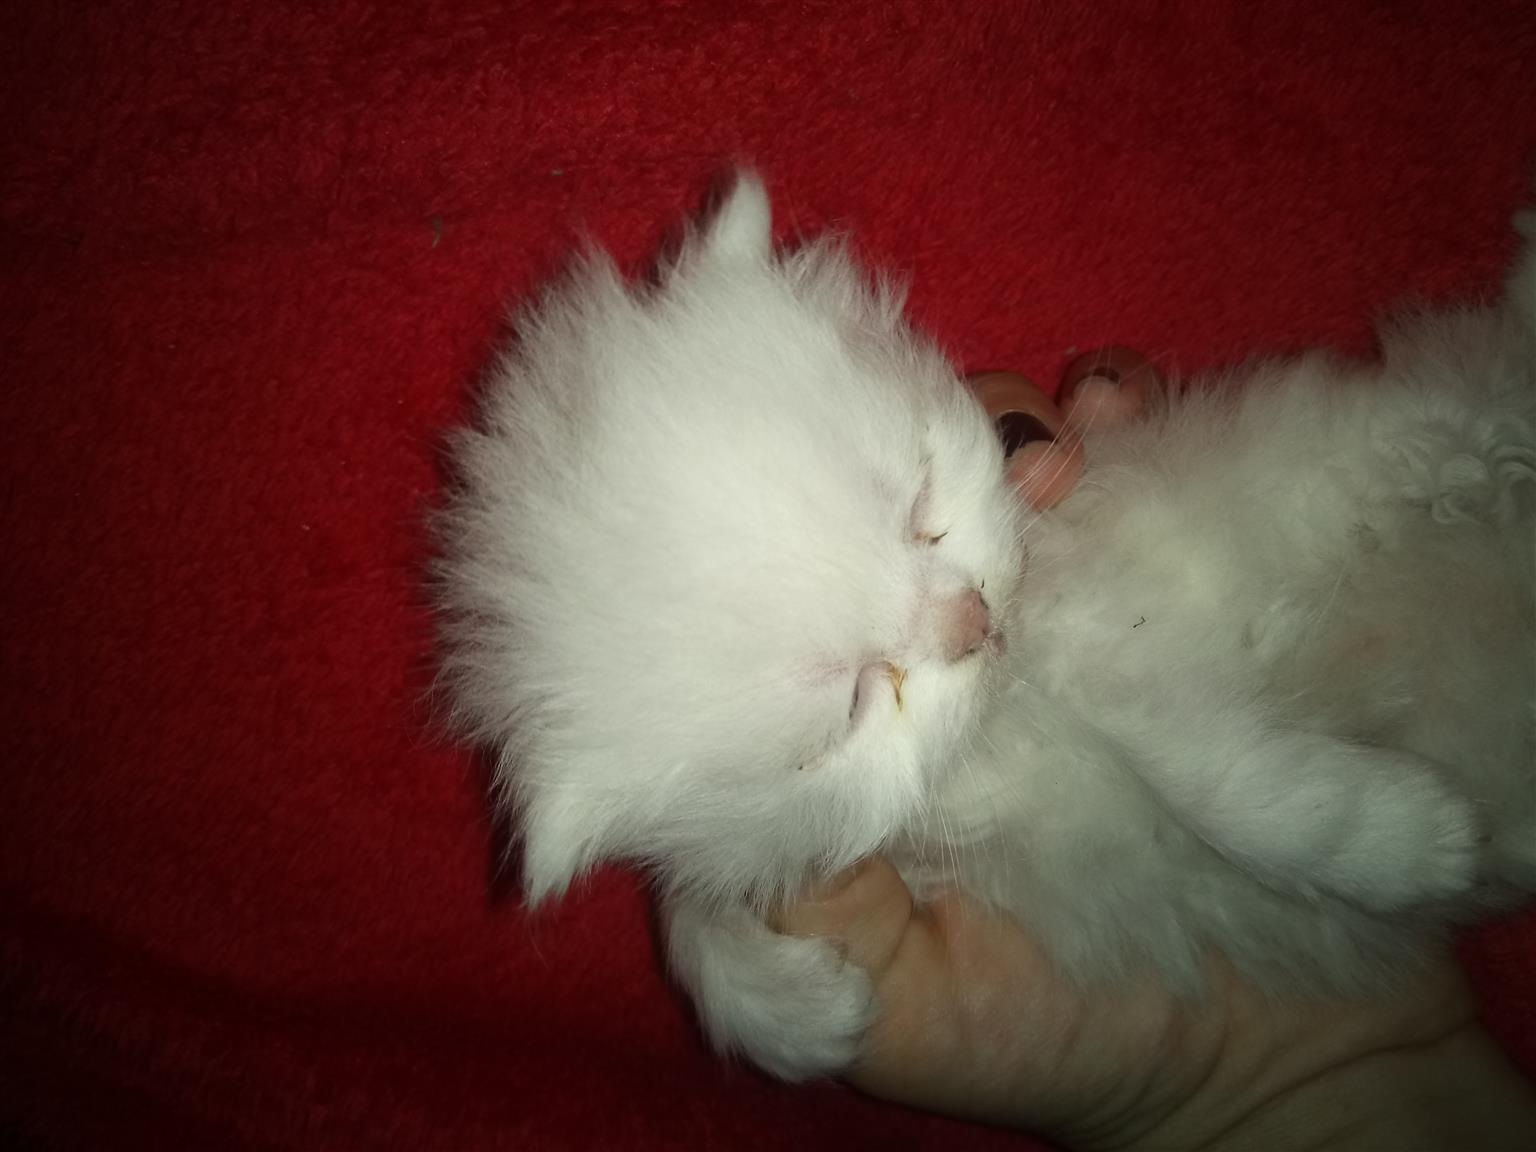 Adorably cute Persian kitten's